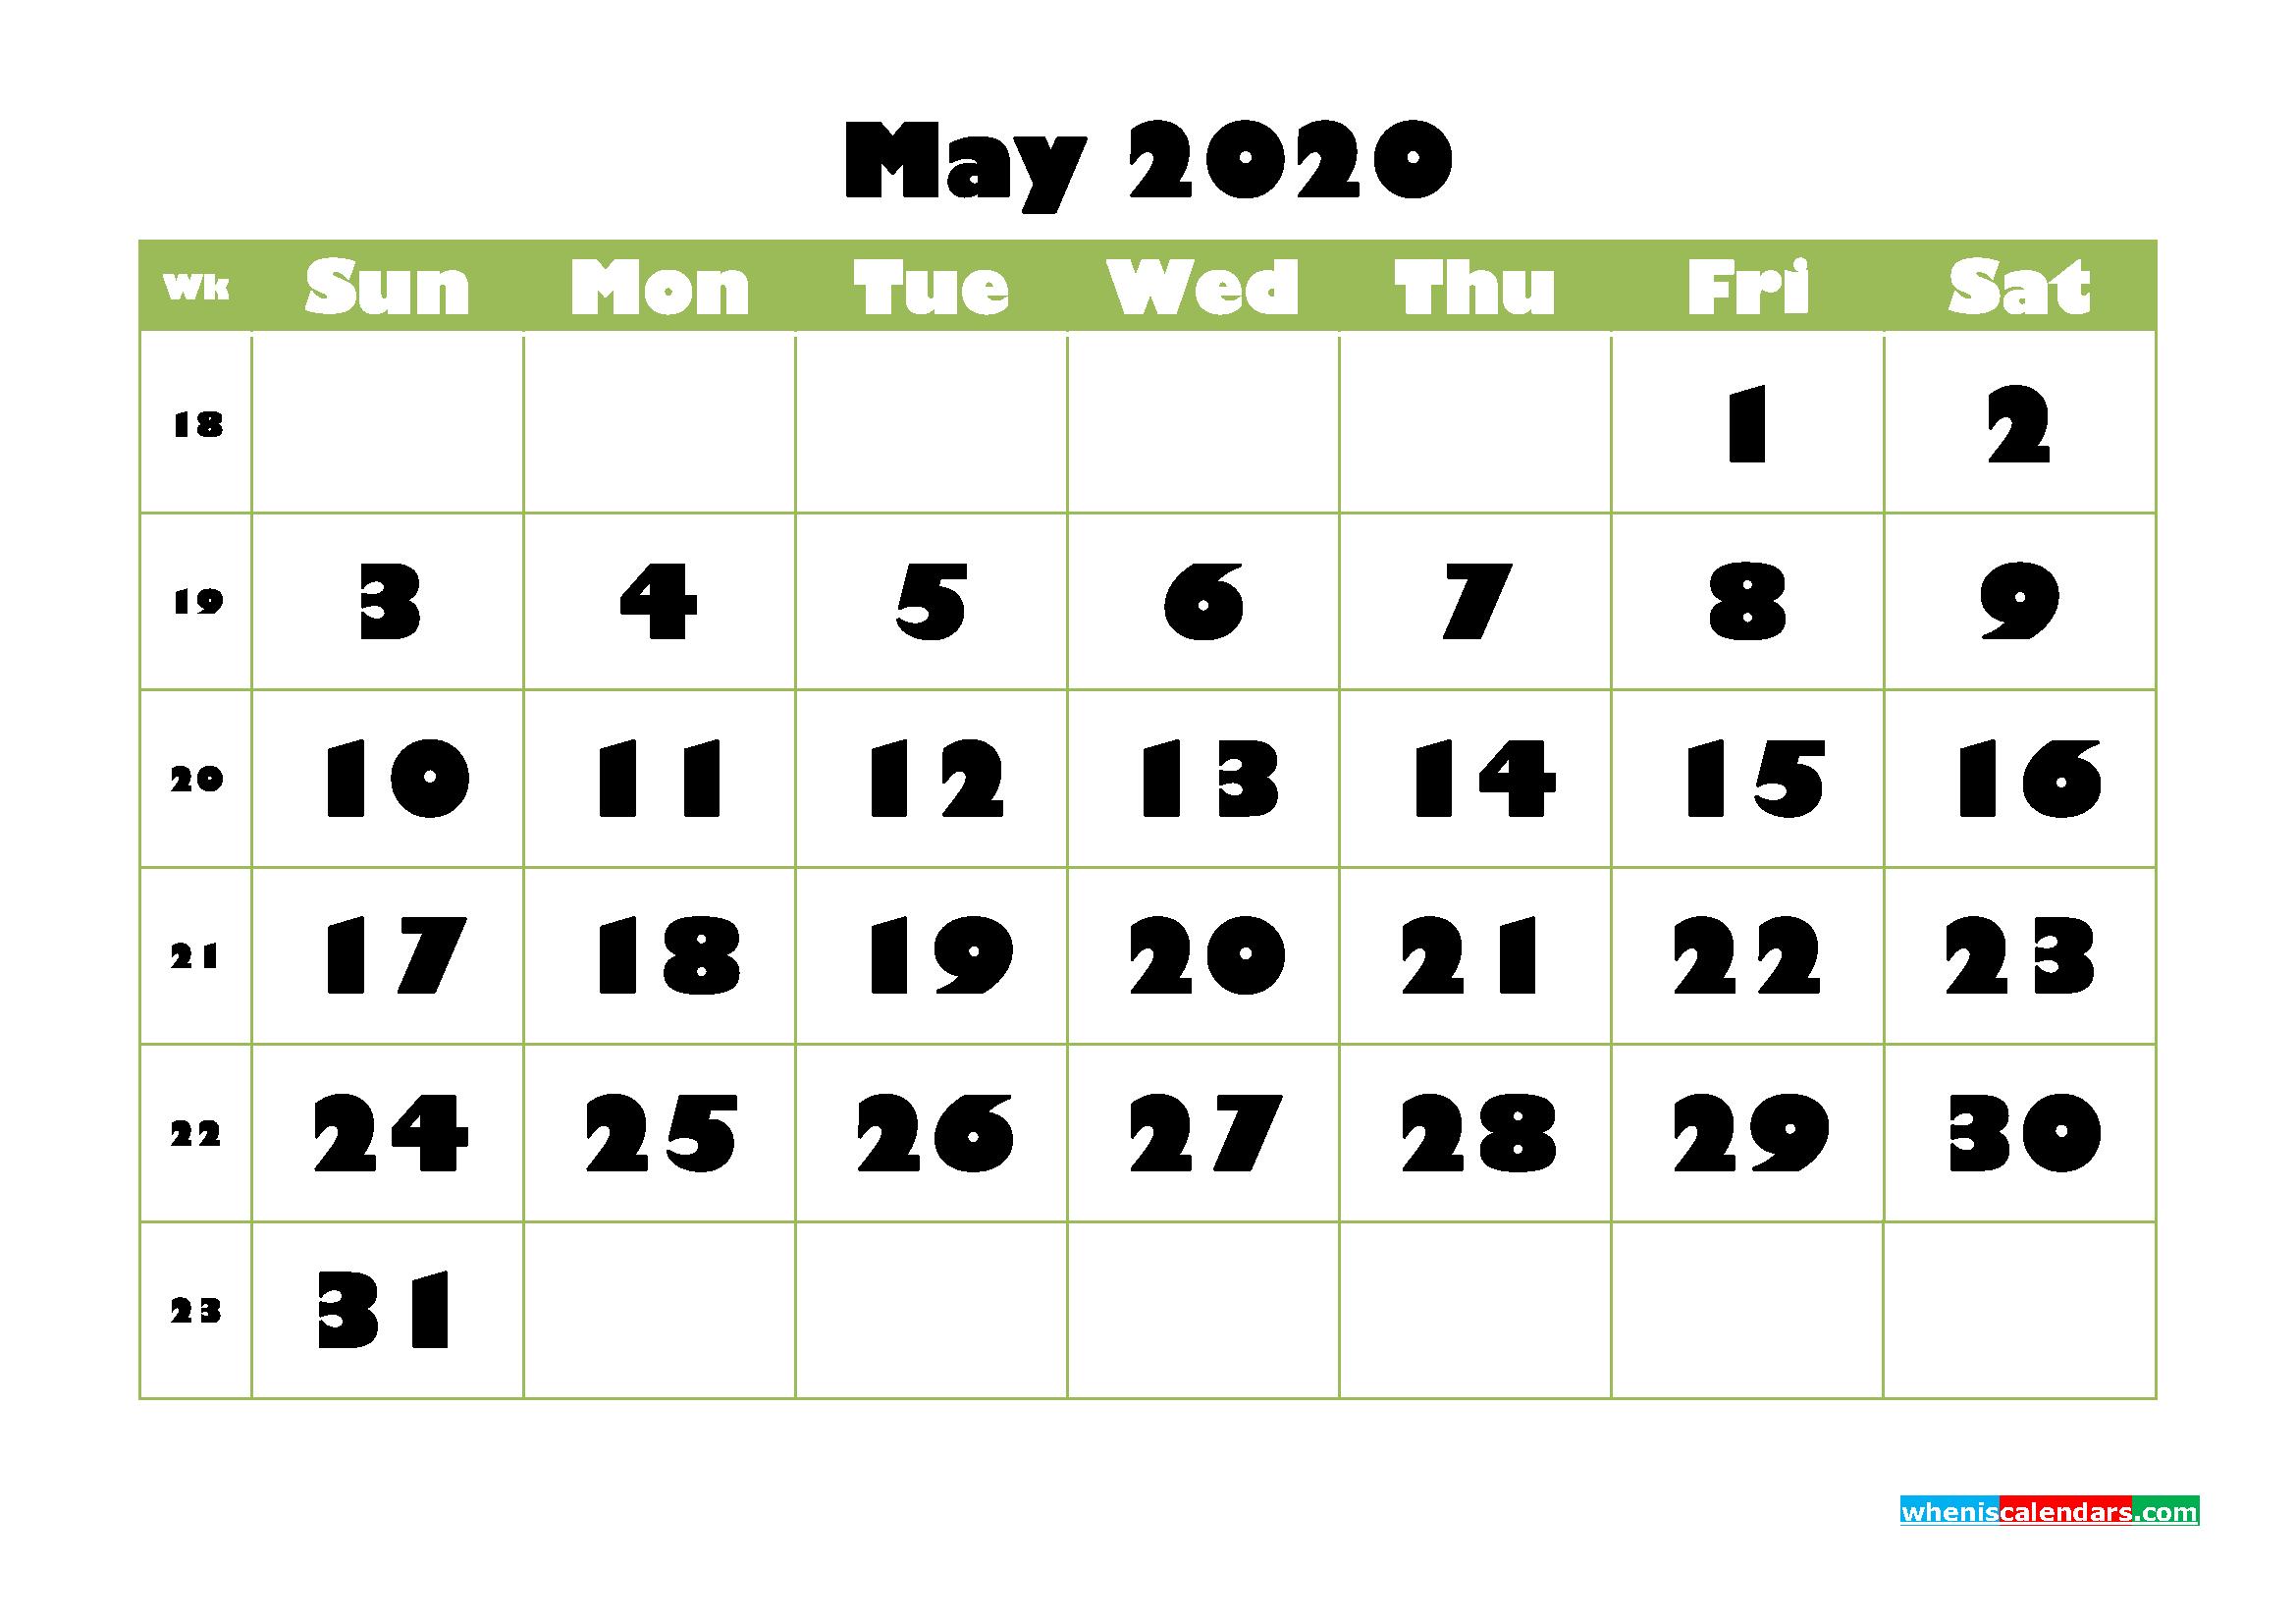 May Printable Calendar 2020 PDF, Word - No.m20b737